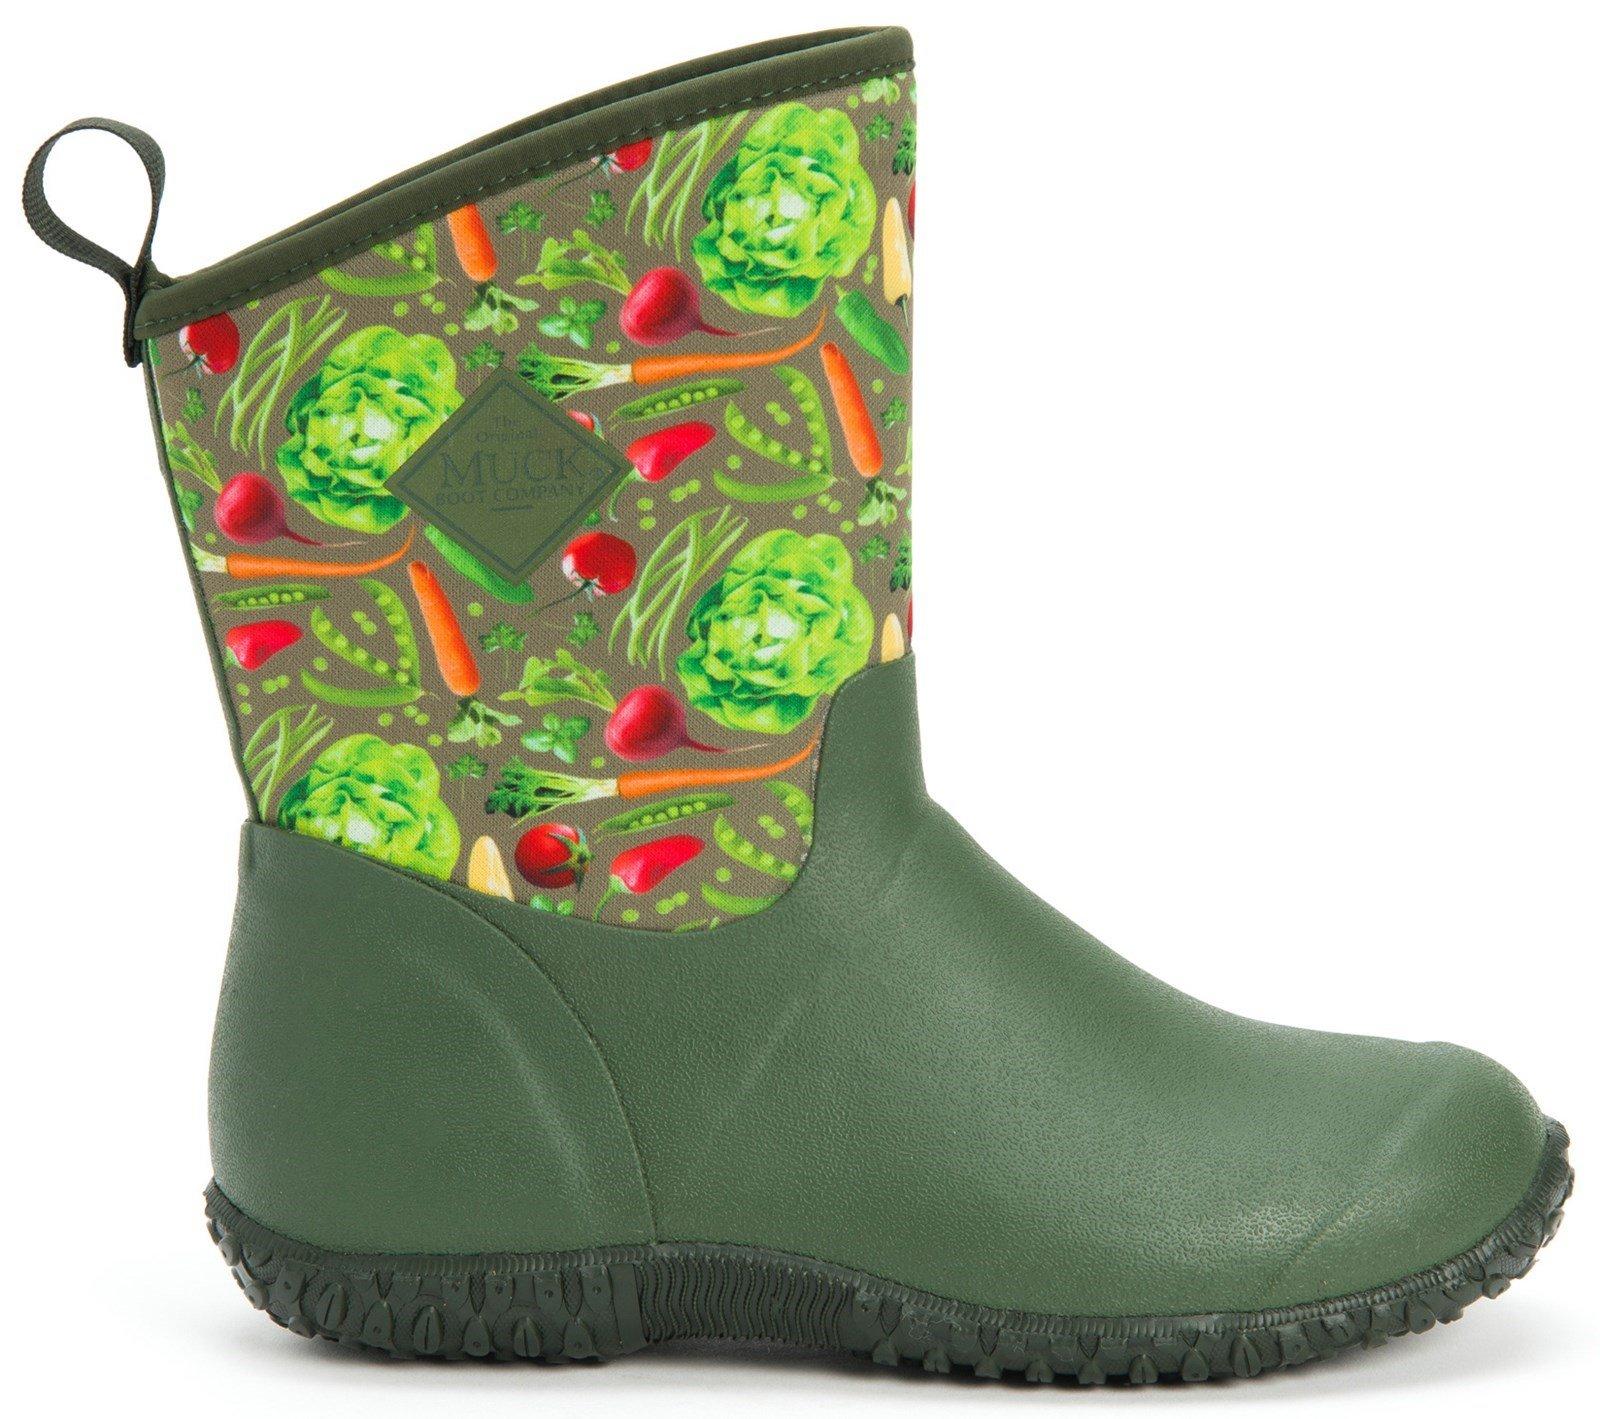 Muck Boots Unisex Muckster II Slip On Short Boot Various Colours 28899 - Green Veggie Print 3